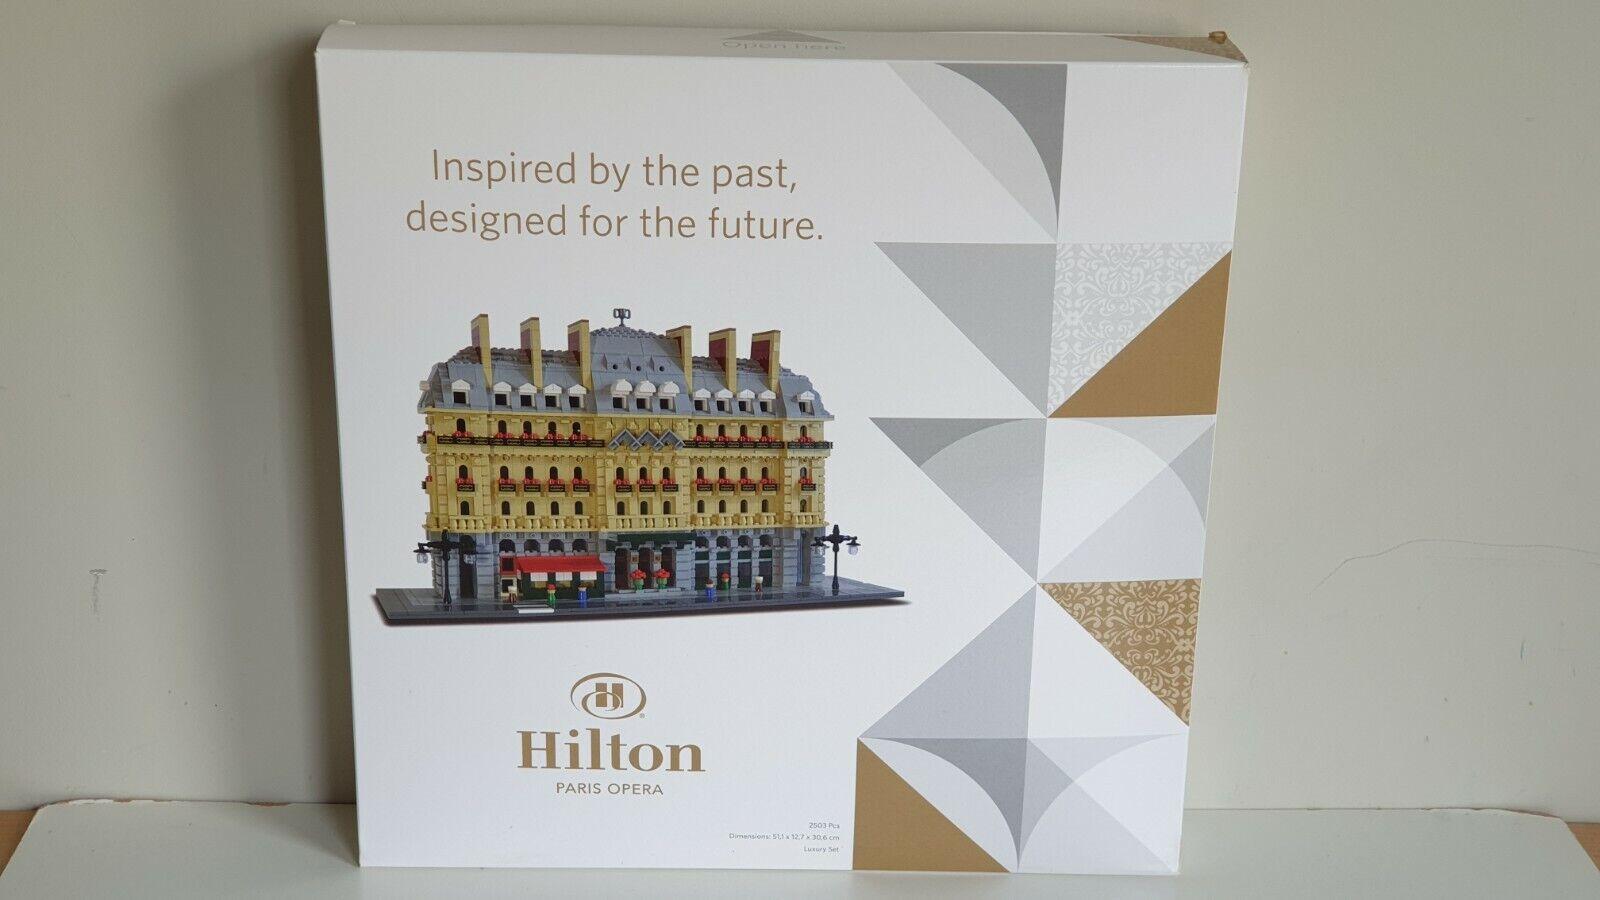 Lego Lego Lego Certified Professional Hilton Paris Opera Modular very rare 80d921